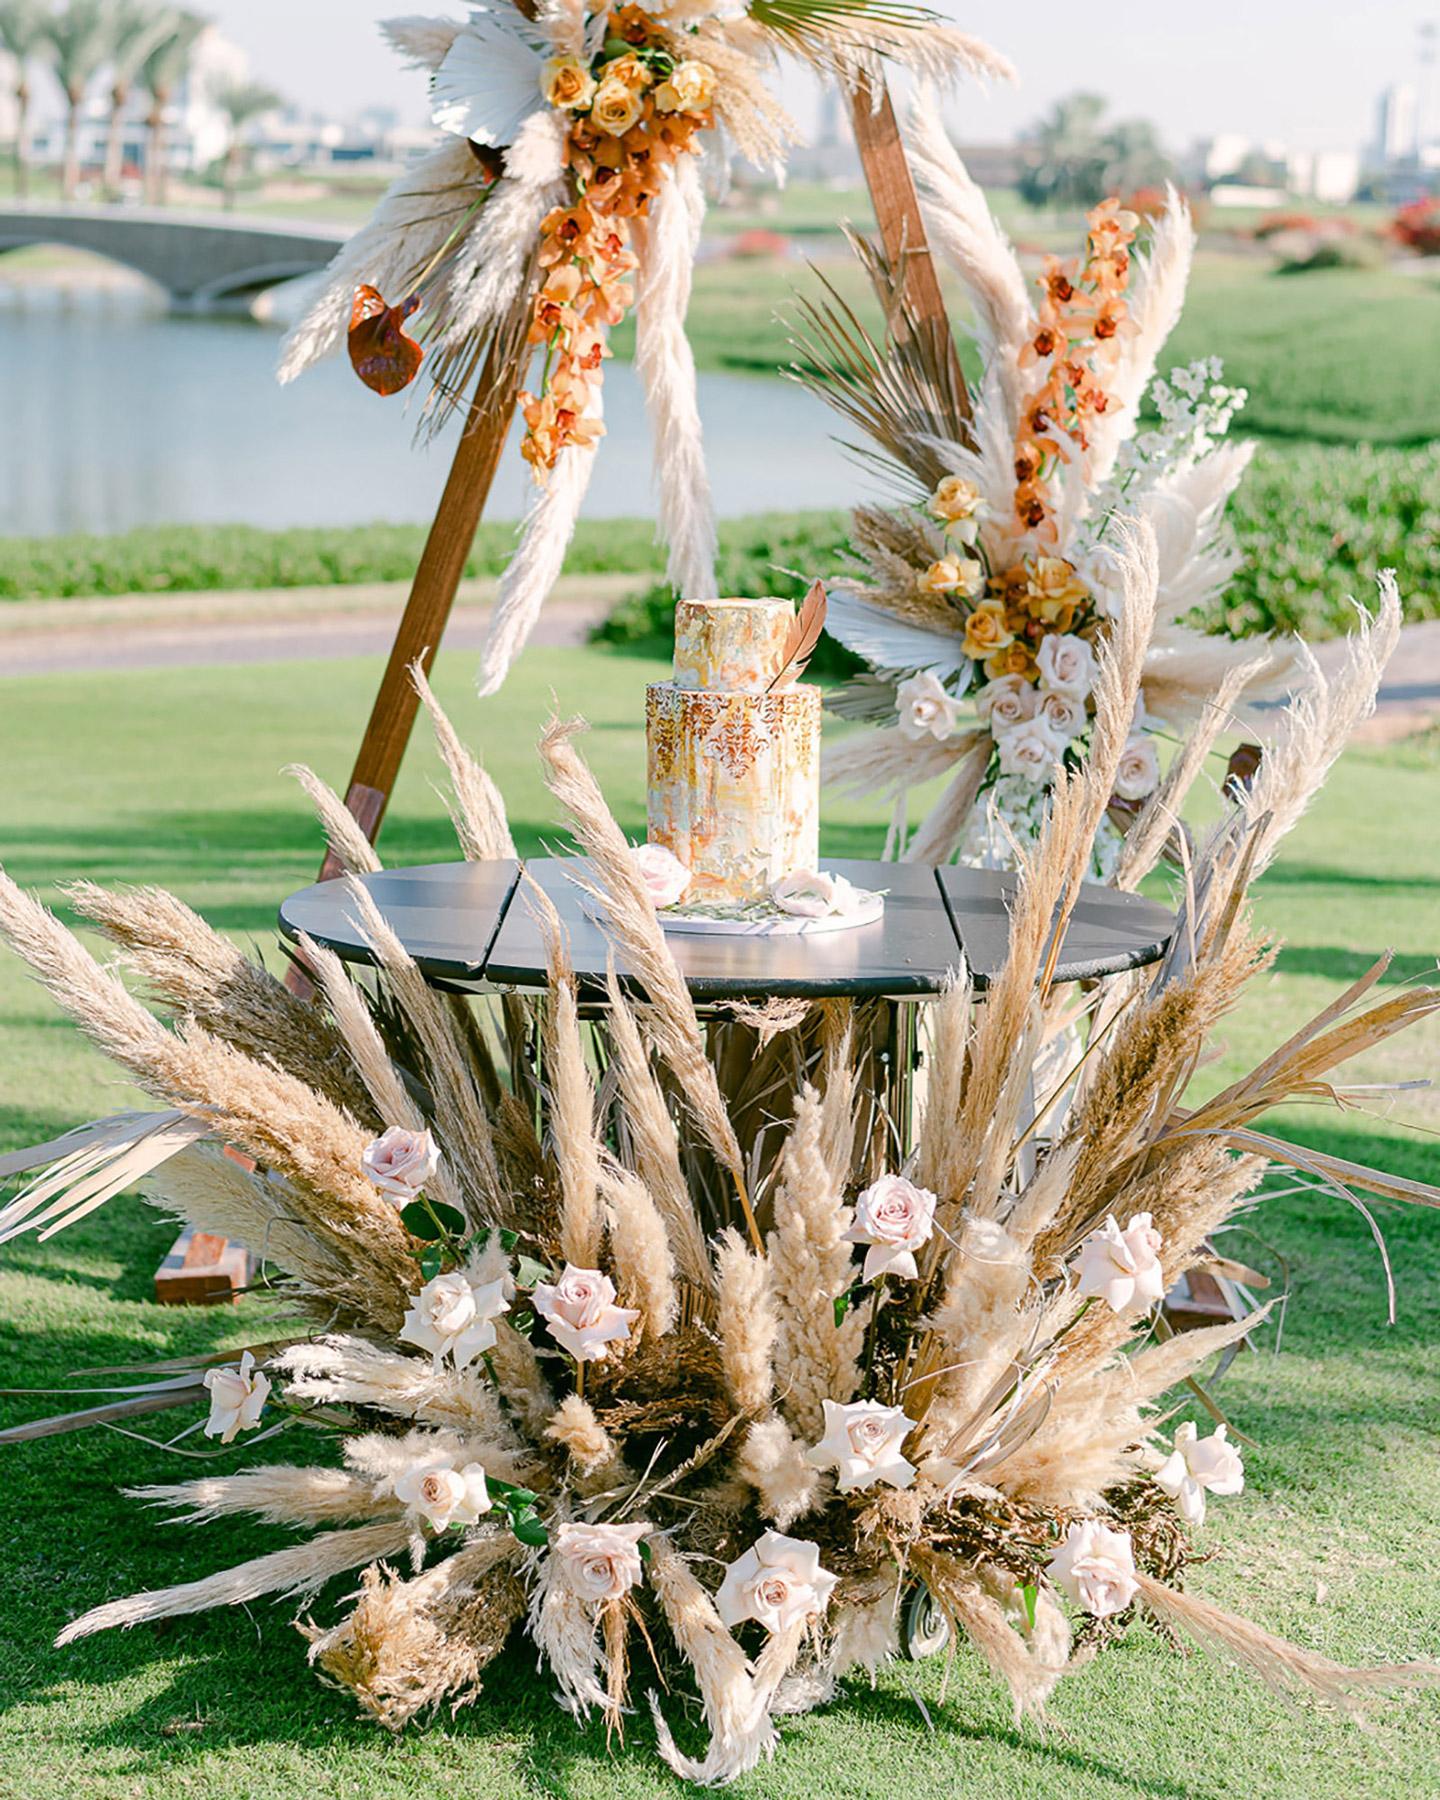 hexagon shaped 2-tier wedding cake on outdoor table